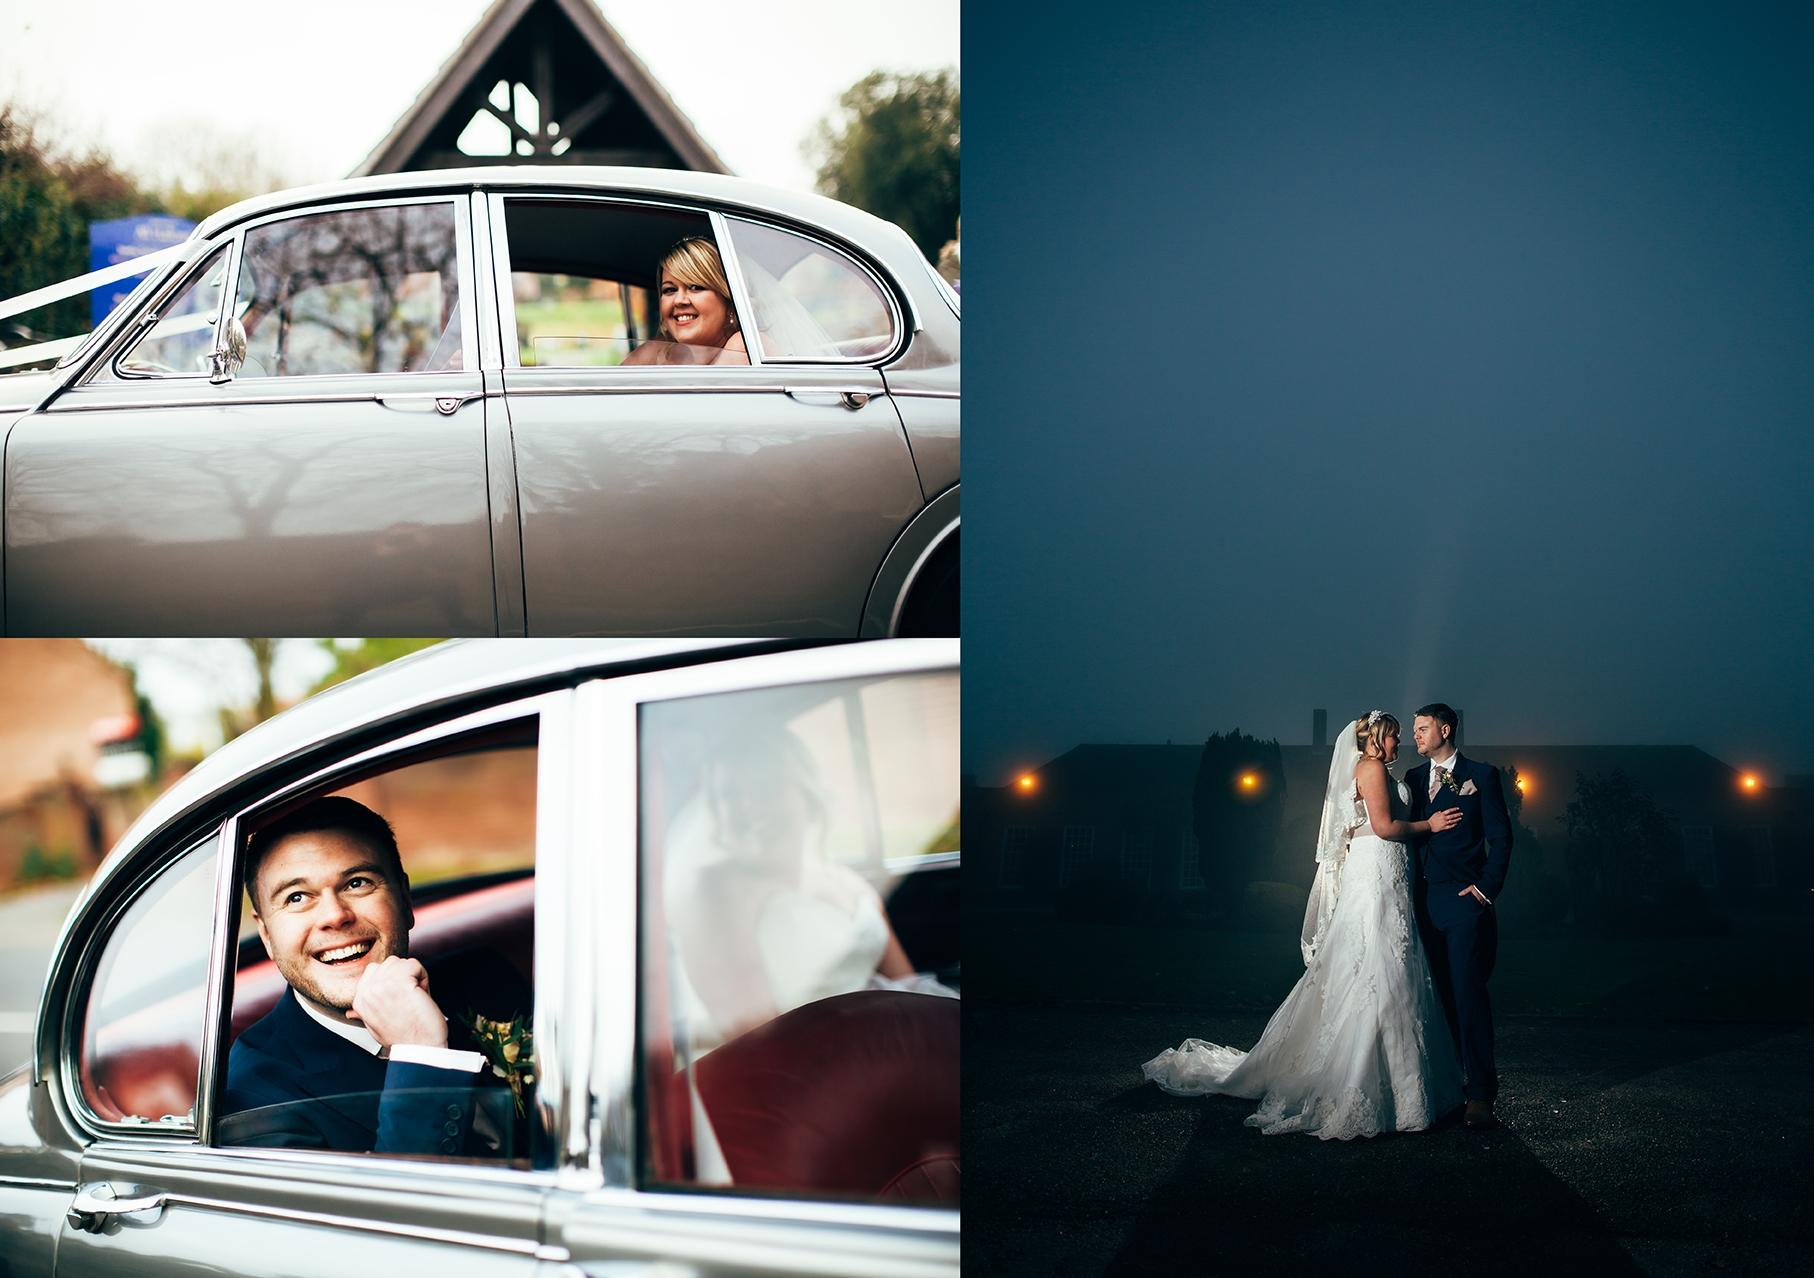 lincolnshire+wedding+photographer-4.jpg